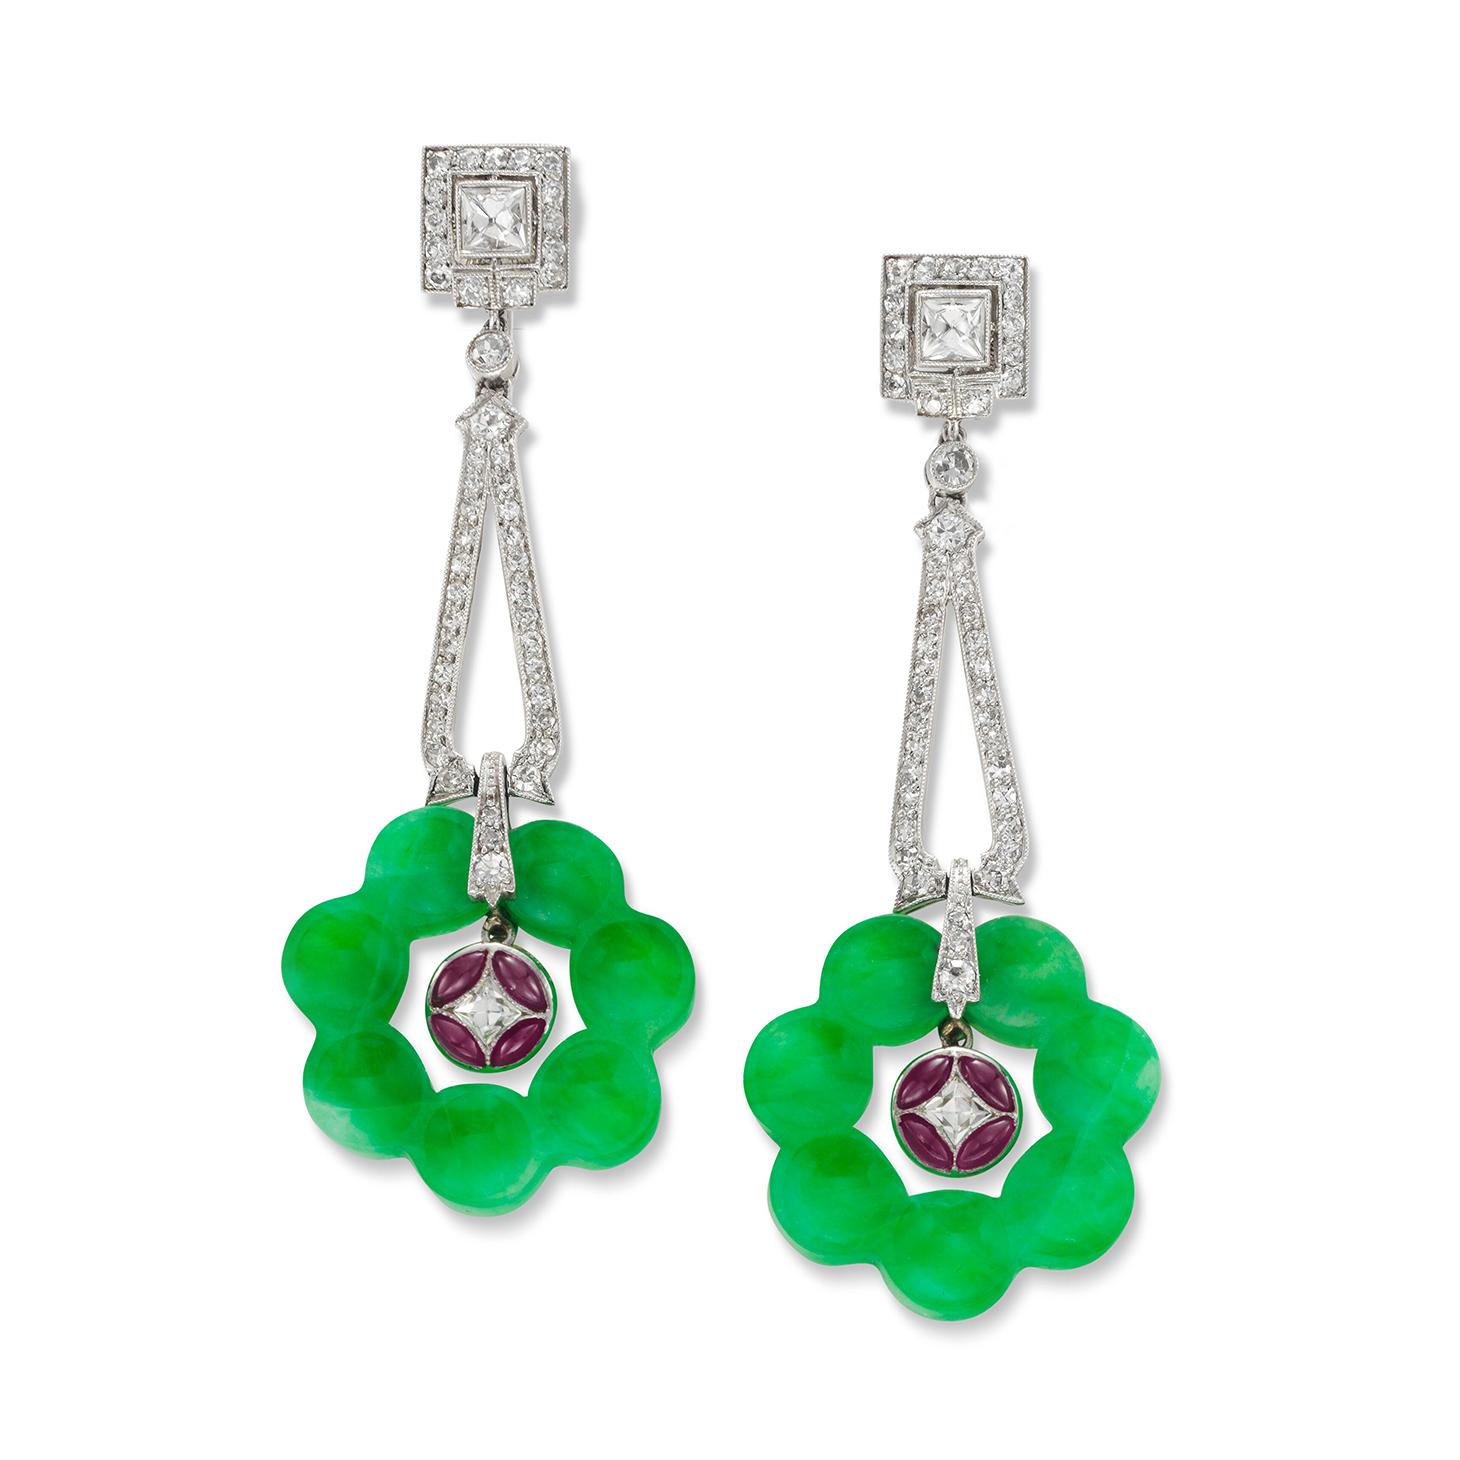 A Pair of Jade, Ruby and Diamond Ear Pendants, by Tiffany & Co., circa 1930